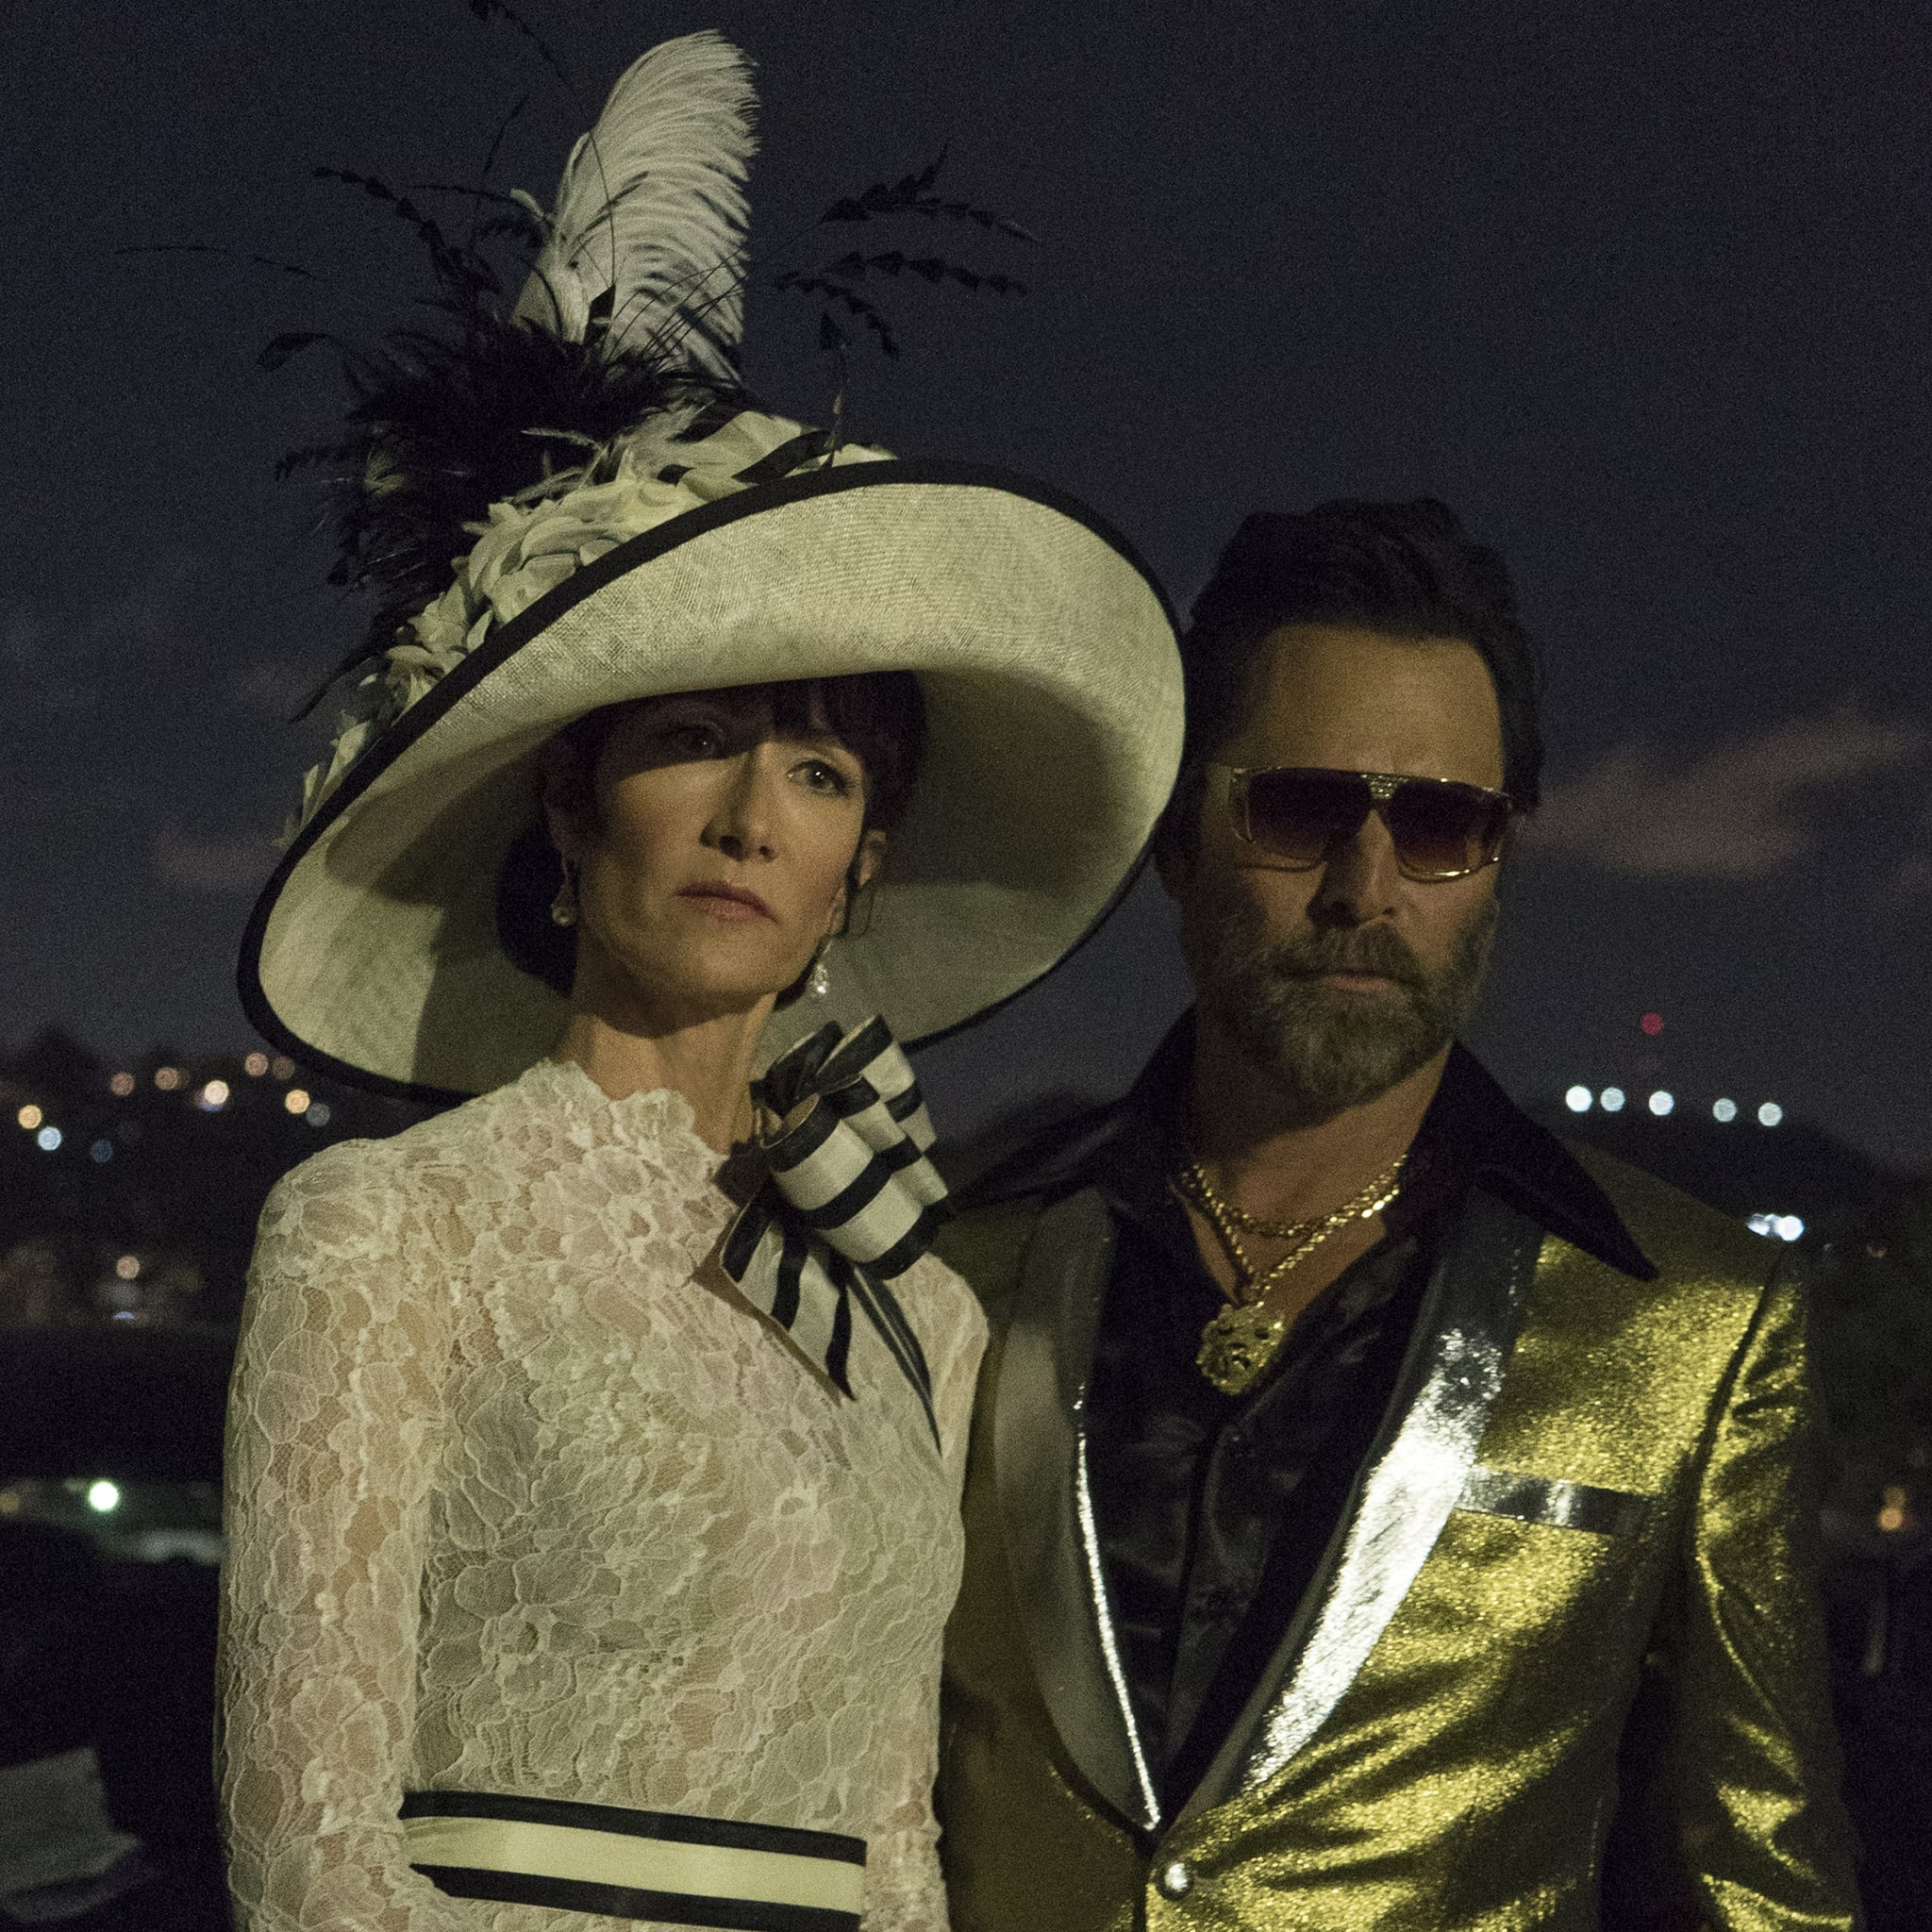 Elvis presley and audrey hepburn costume ideas popsugar love sex solutioingenieria Image collections